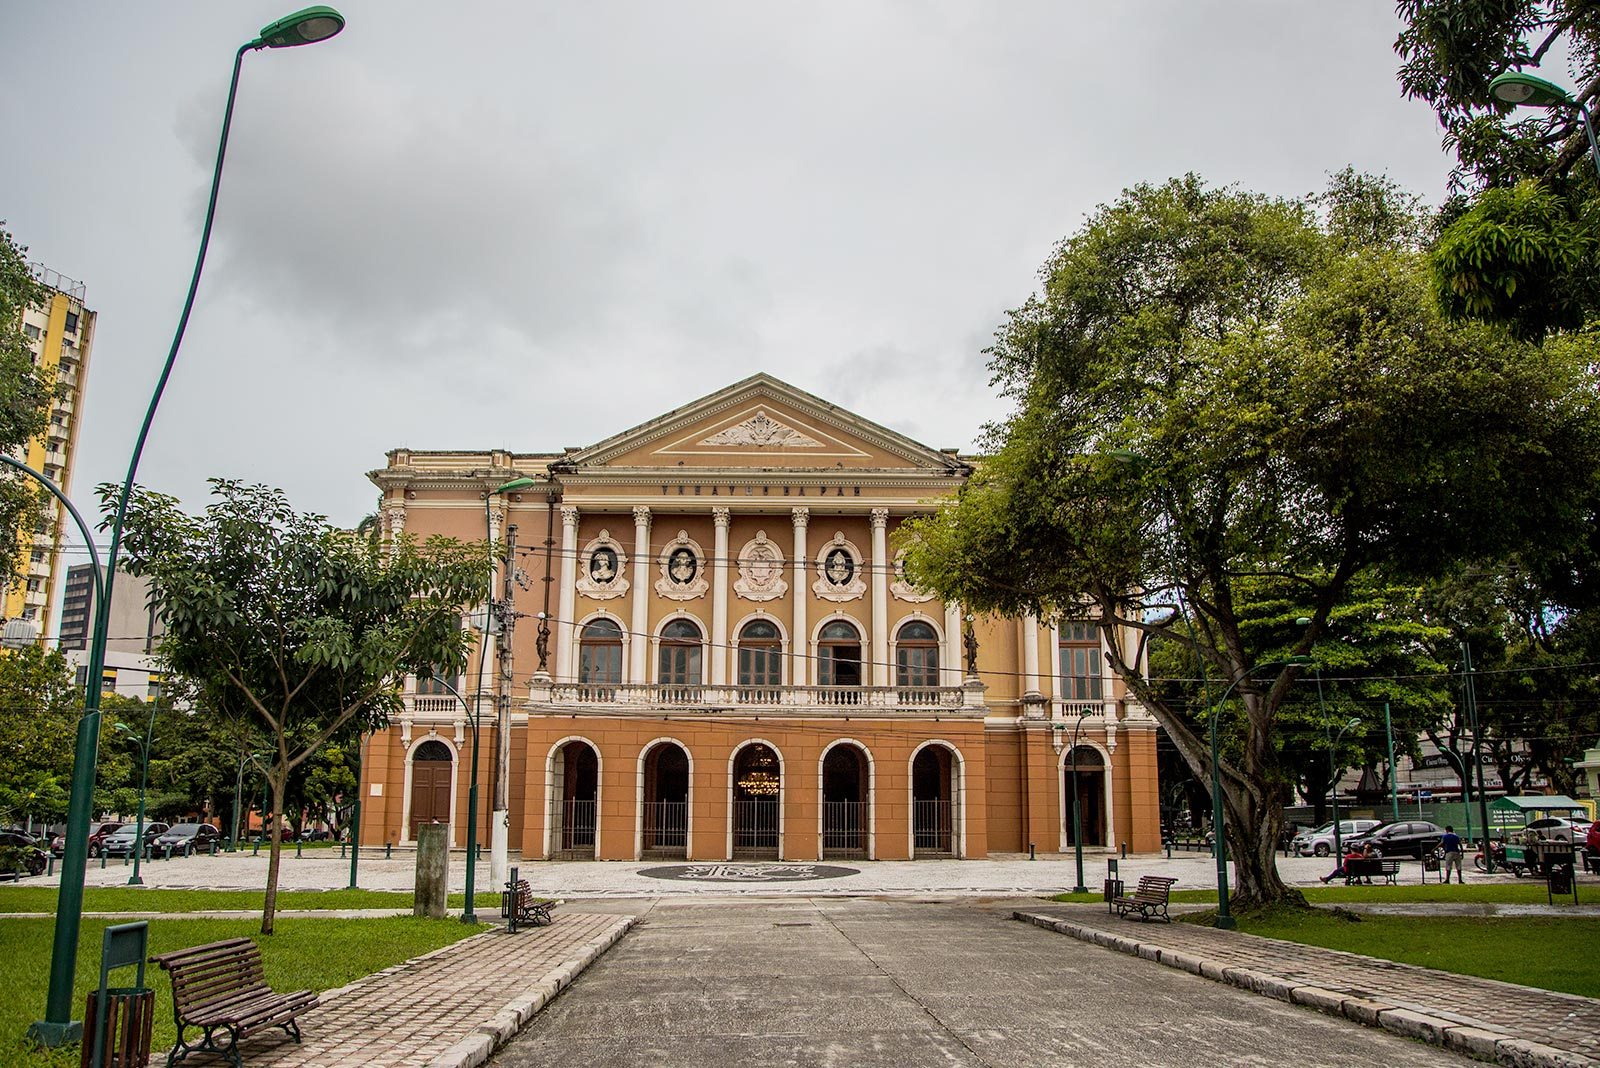 Theatro da Paz - Belém